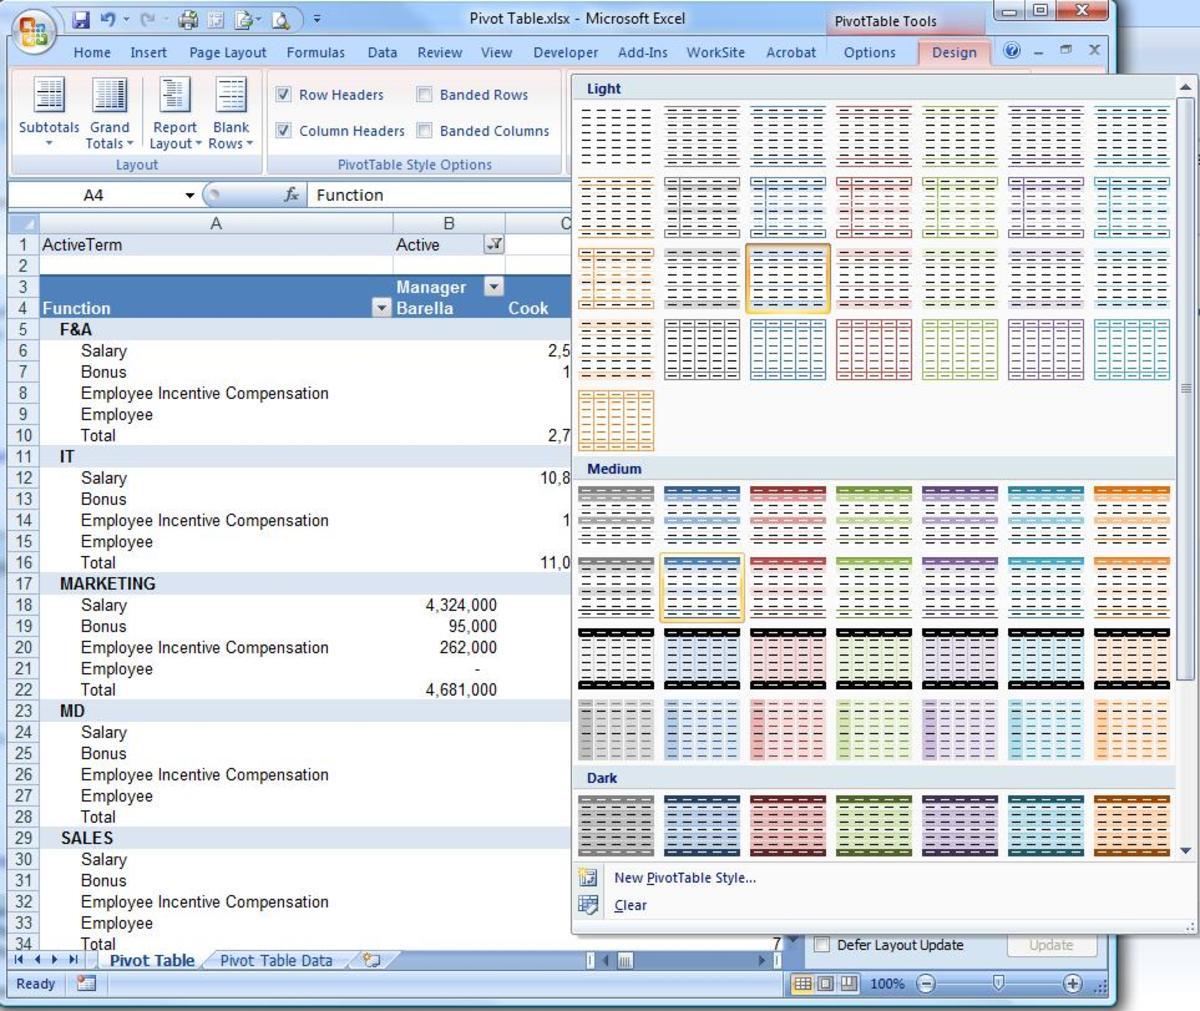 Formatting the Pivot Table